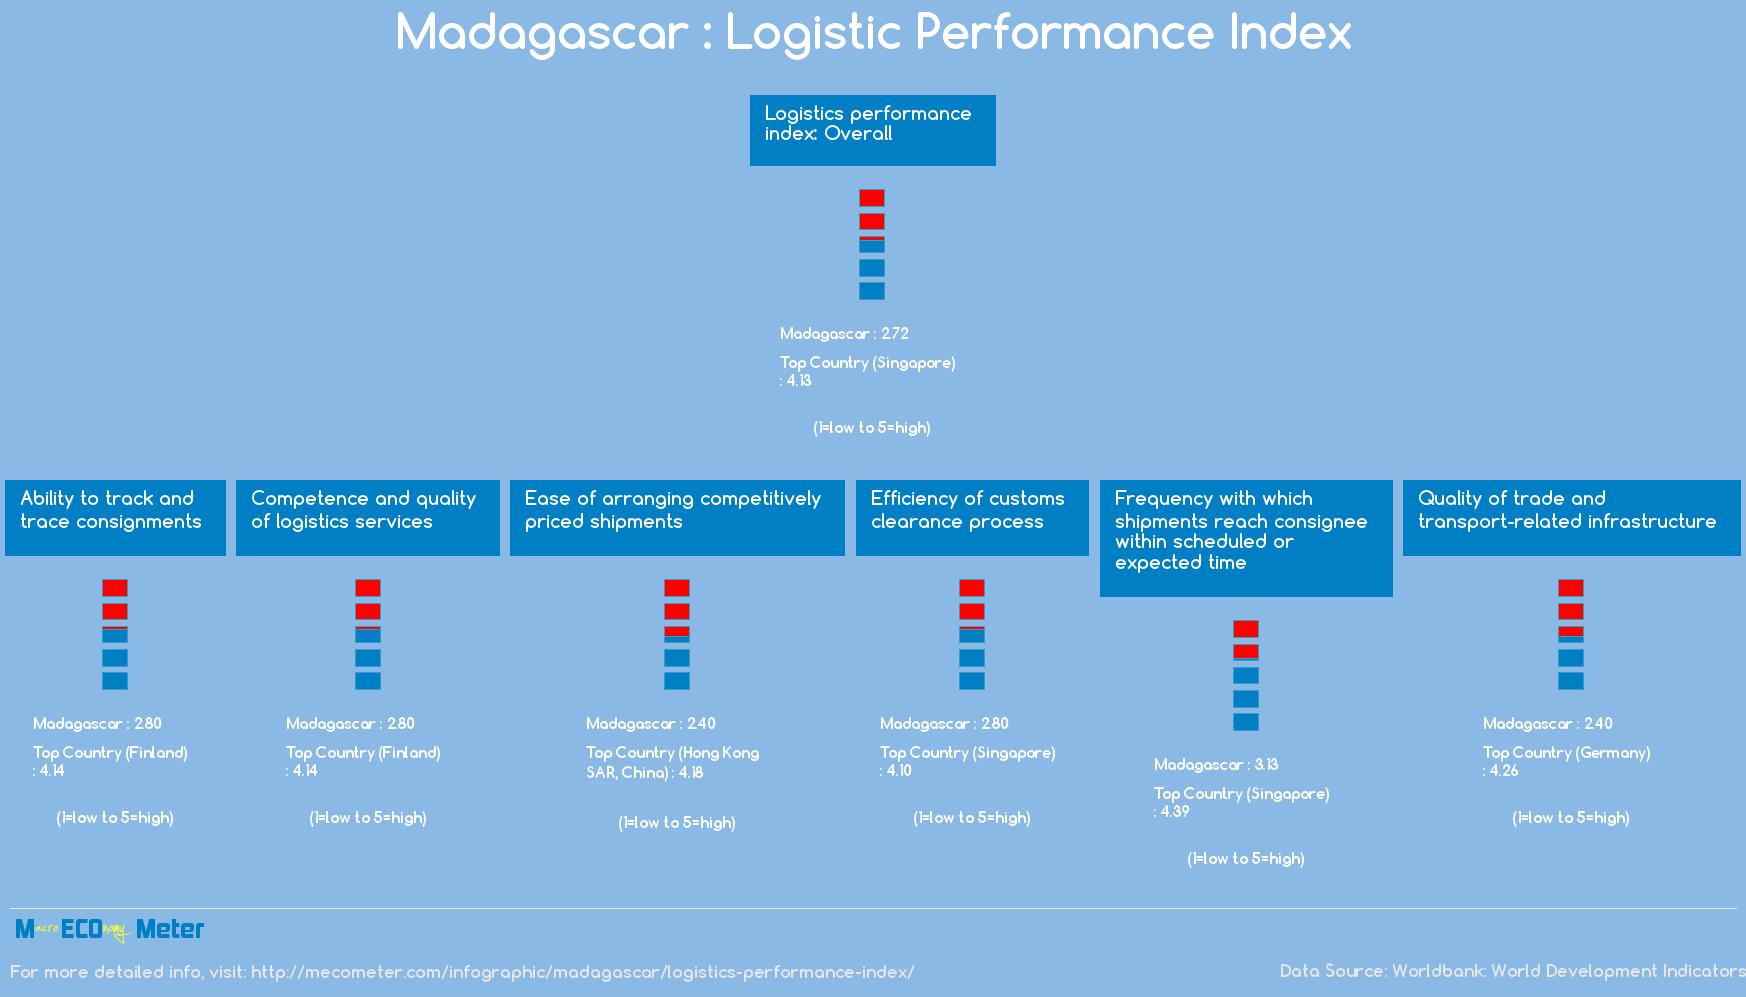 Madagascar : Logistic Performance Index